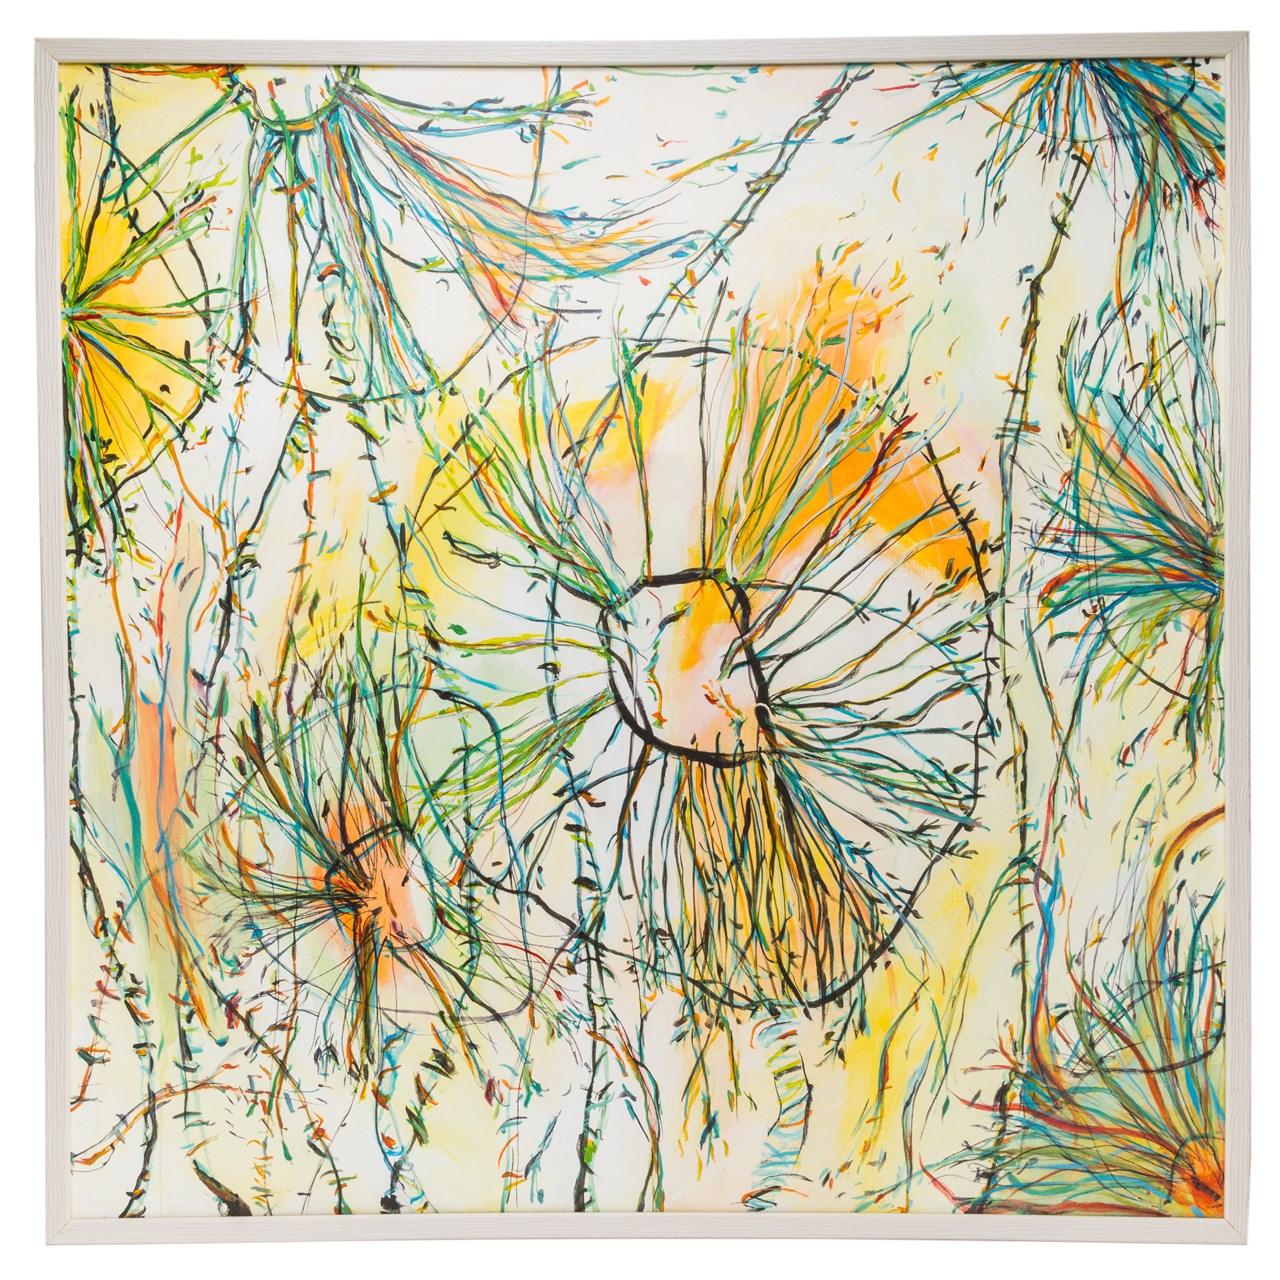 Photo of تابلو نقاشی گالری سی پرشیا طرح قاصدک کد 201320